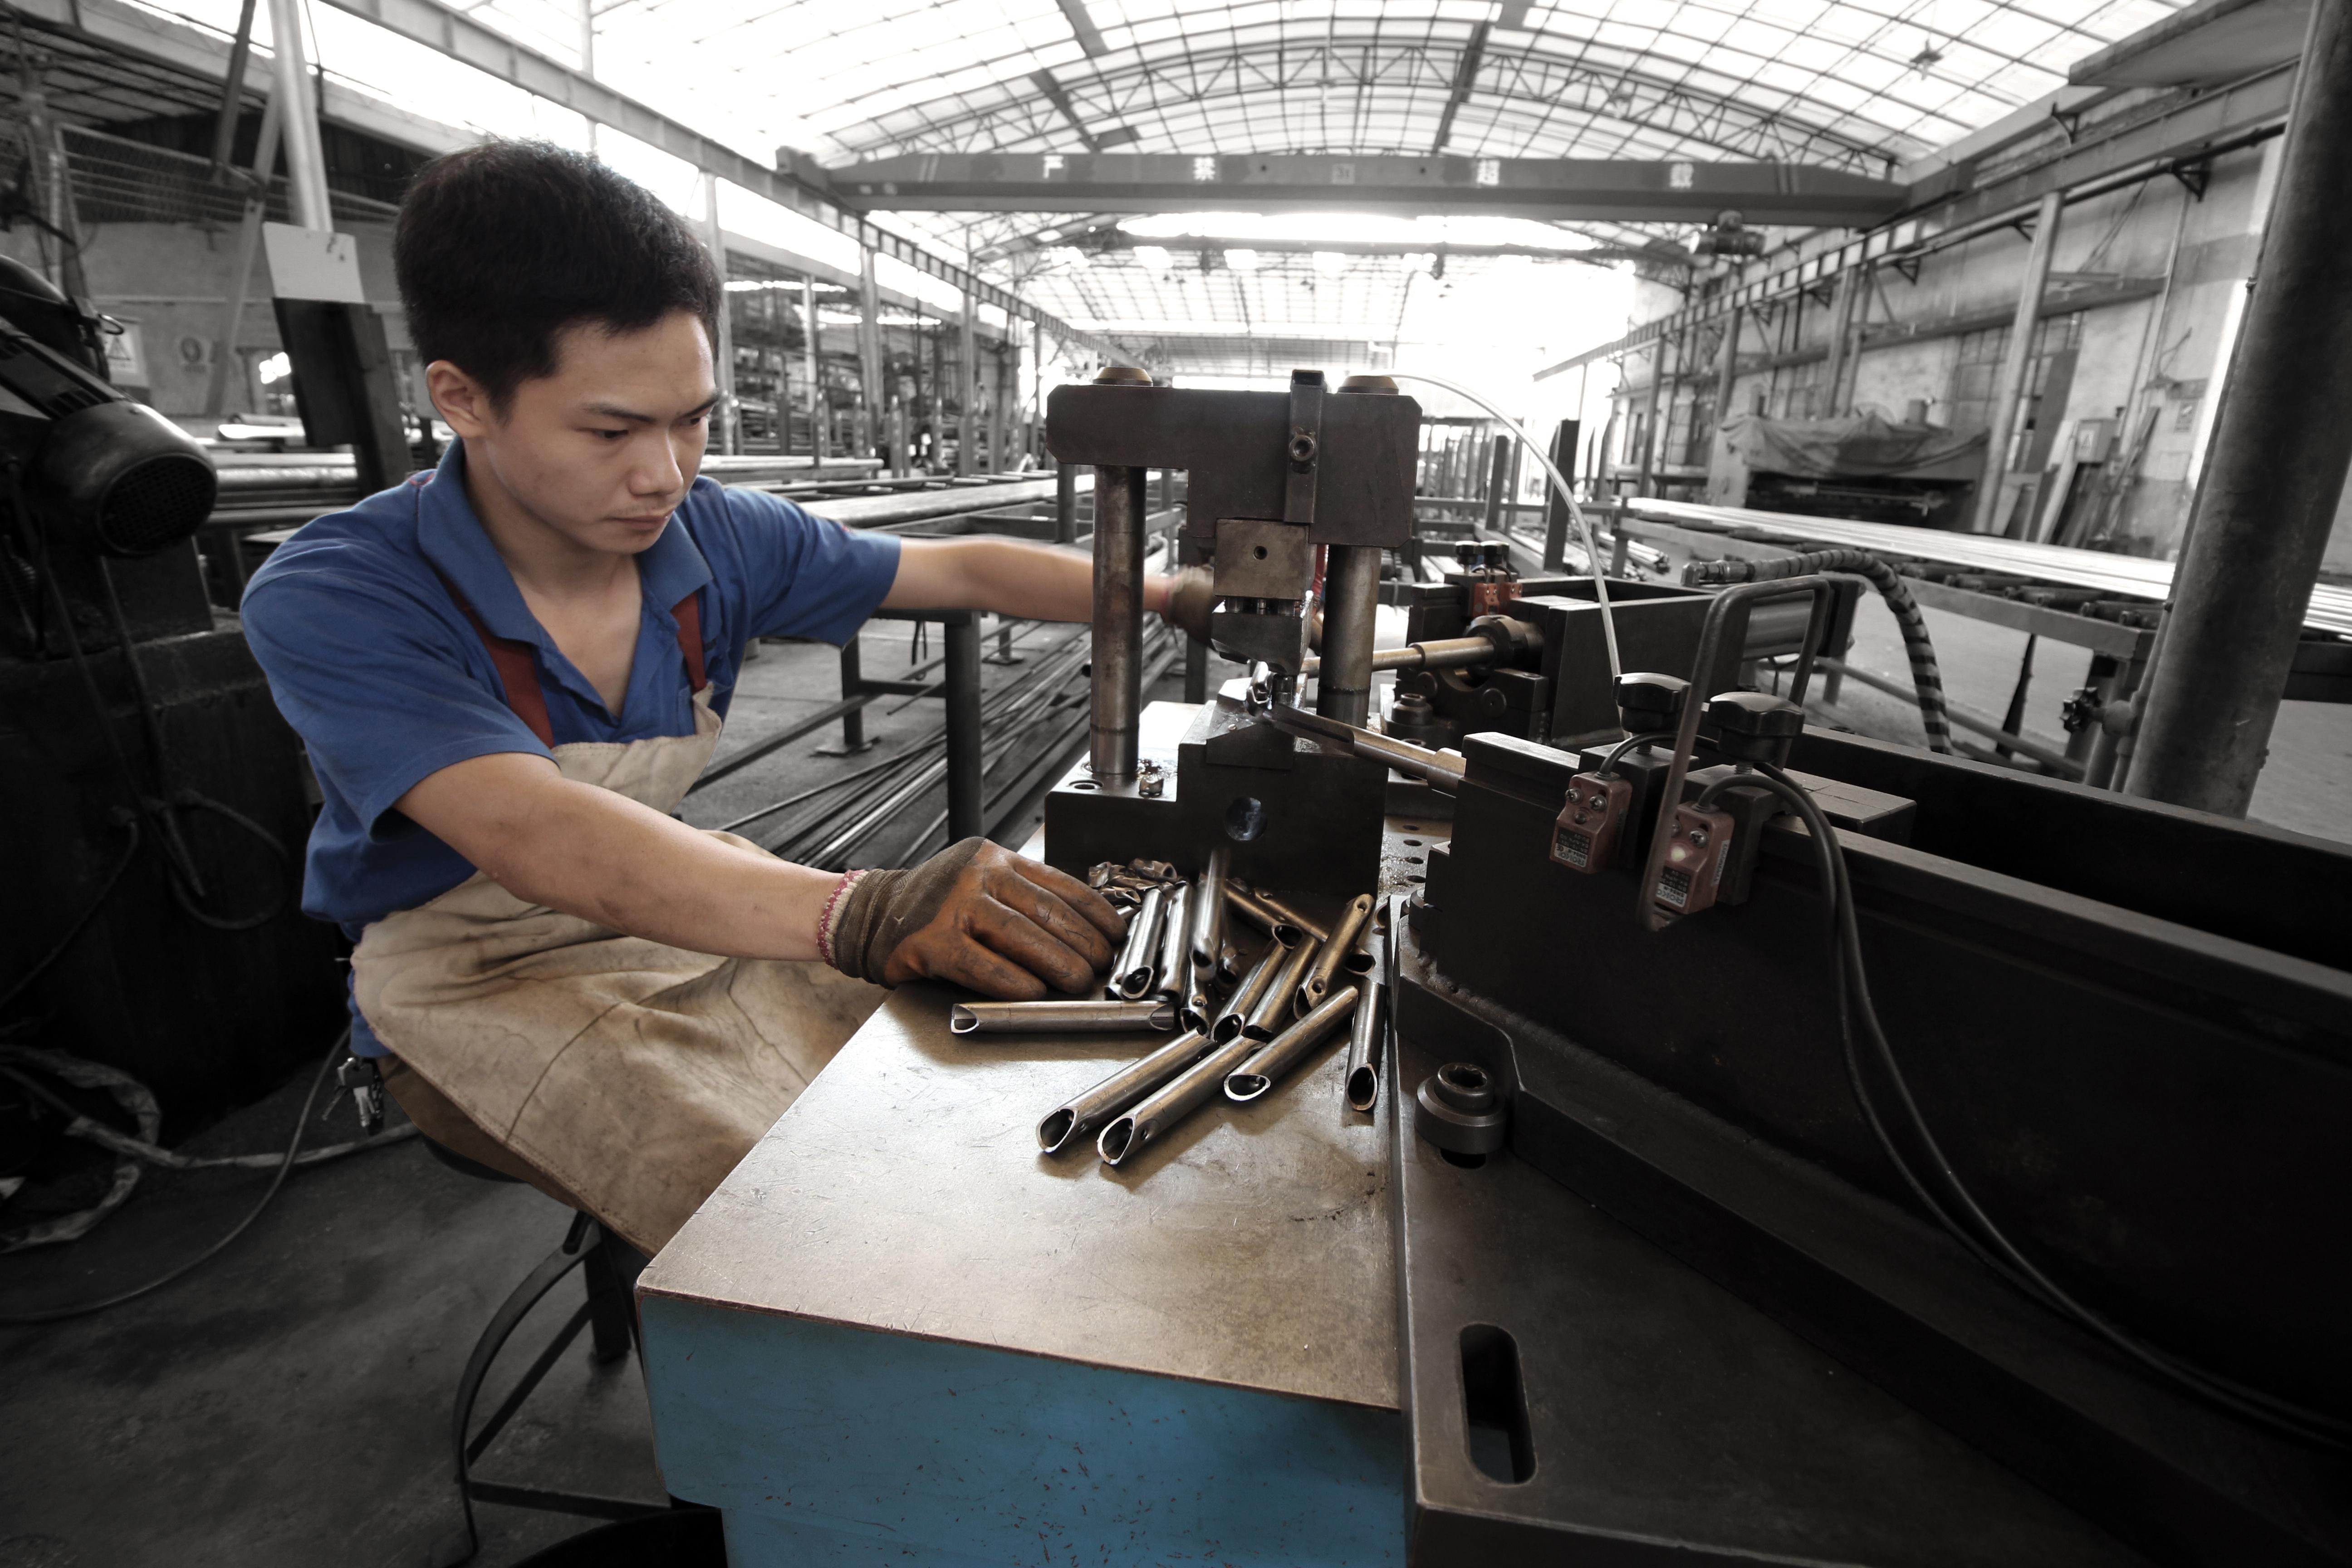 manufacturingcapabilities-metalwork1.jpg